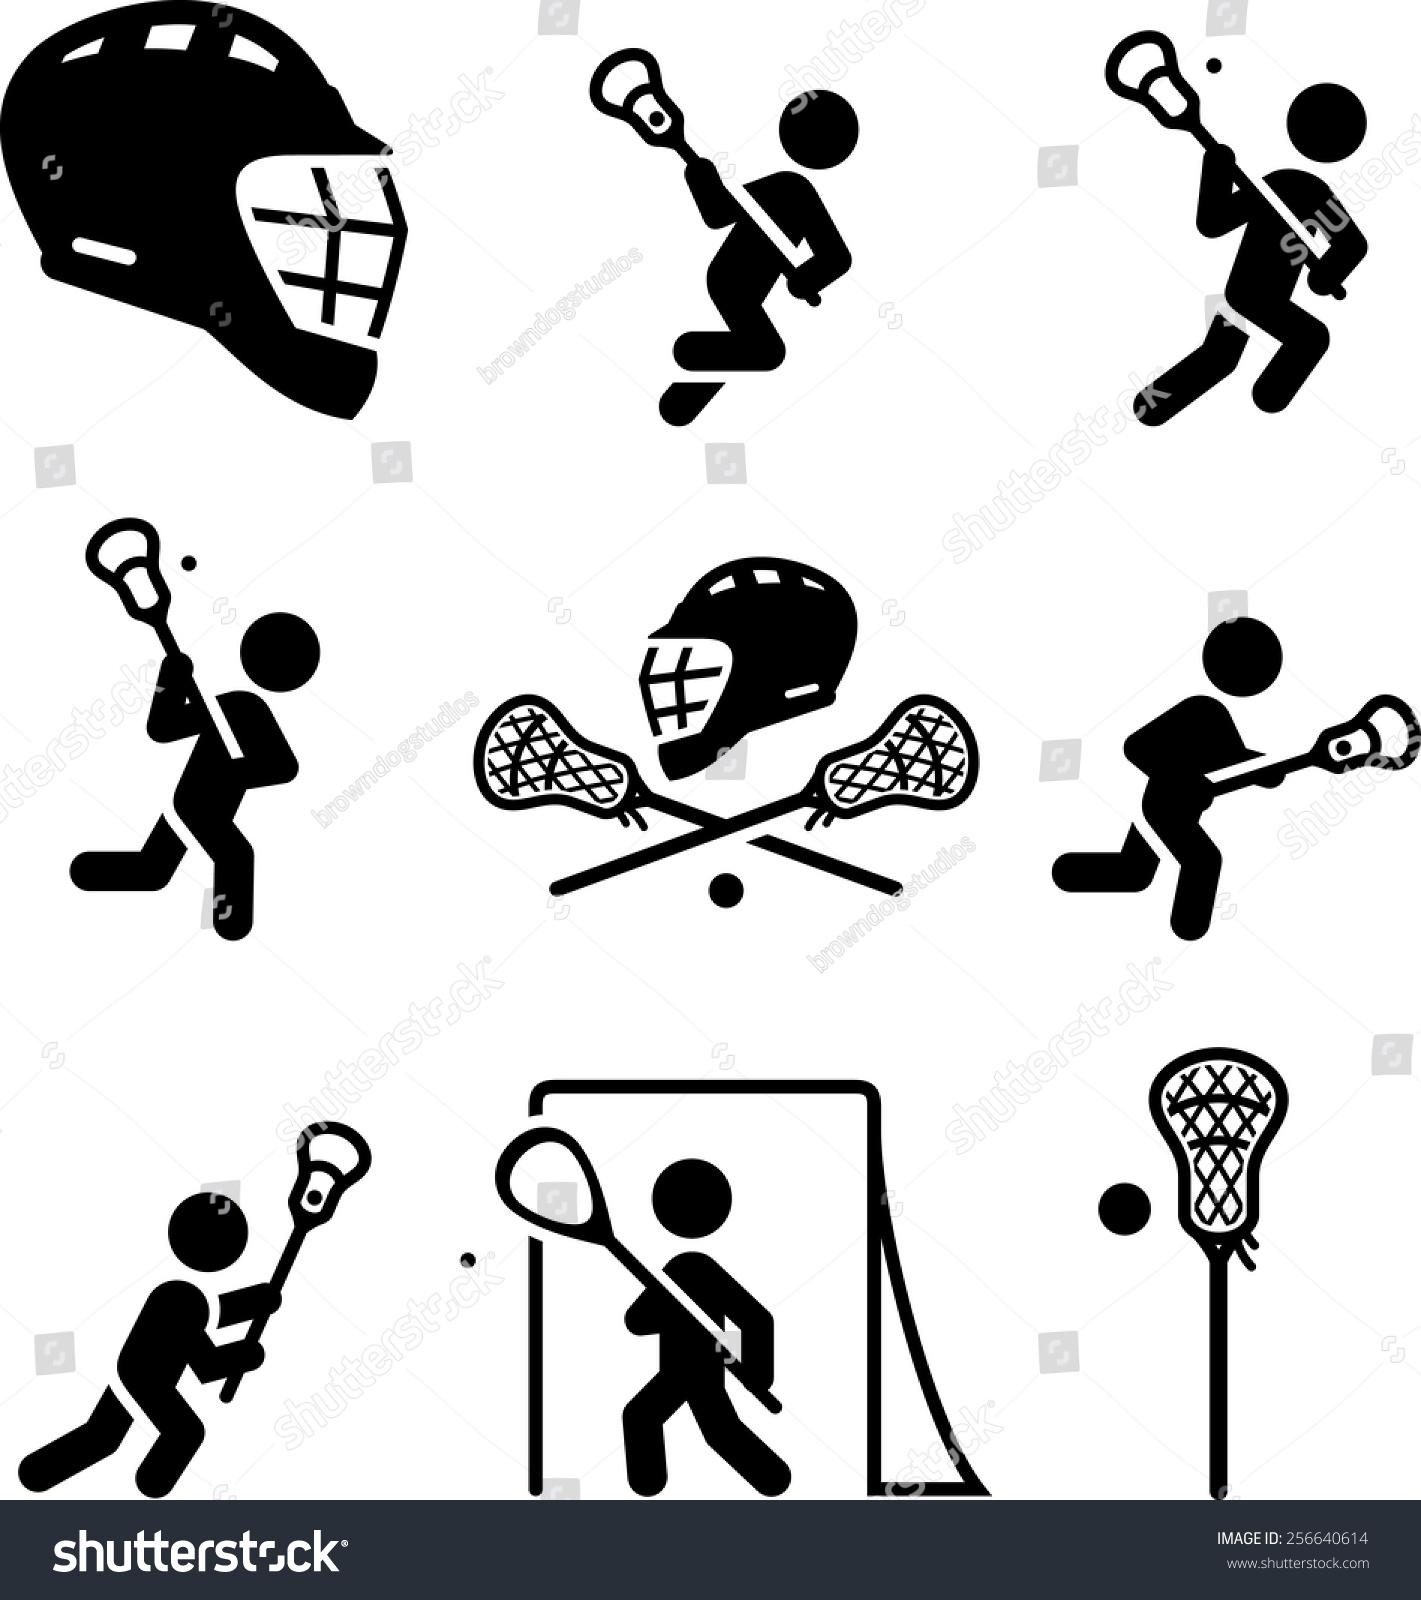 lacrosse icon set vector icons digital stock vector 256640614